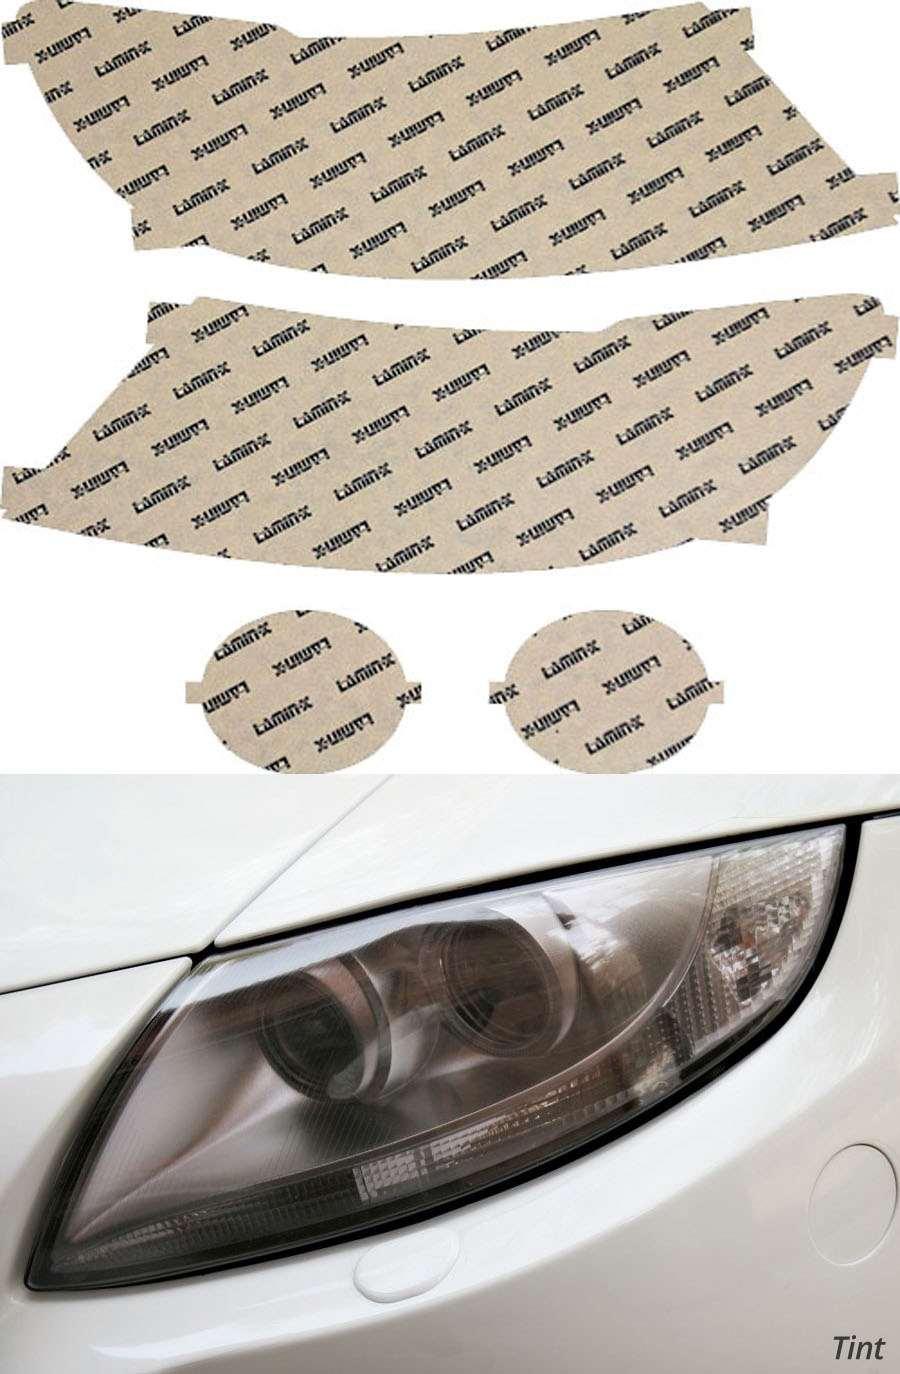 Subaru B9 Tribeca 08-14 Tint Headlight Covers Lamin-X S018T